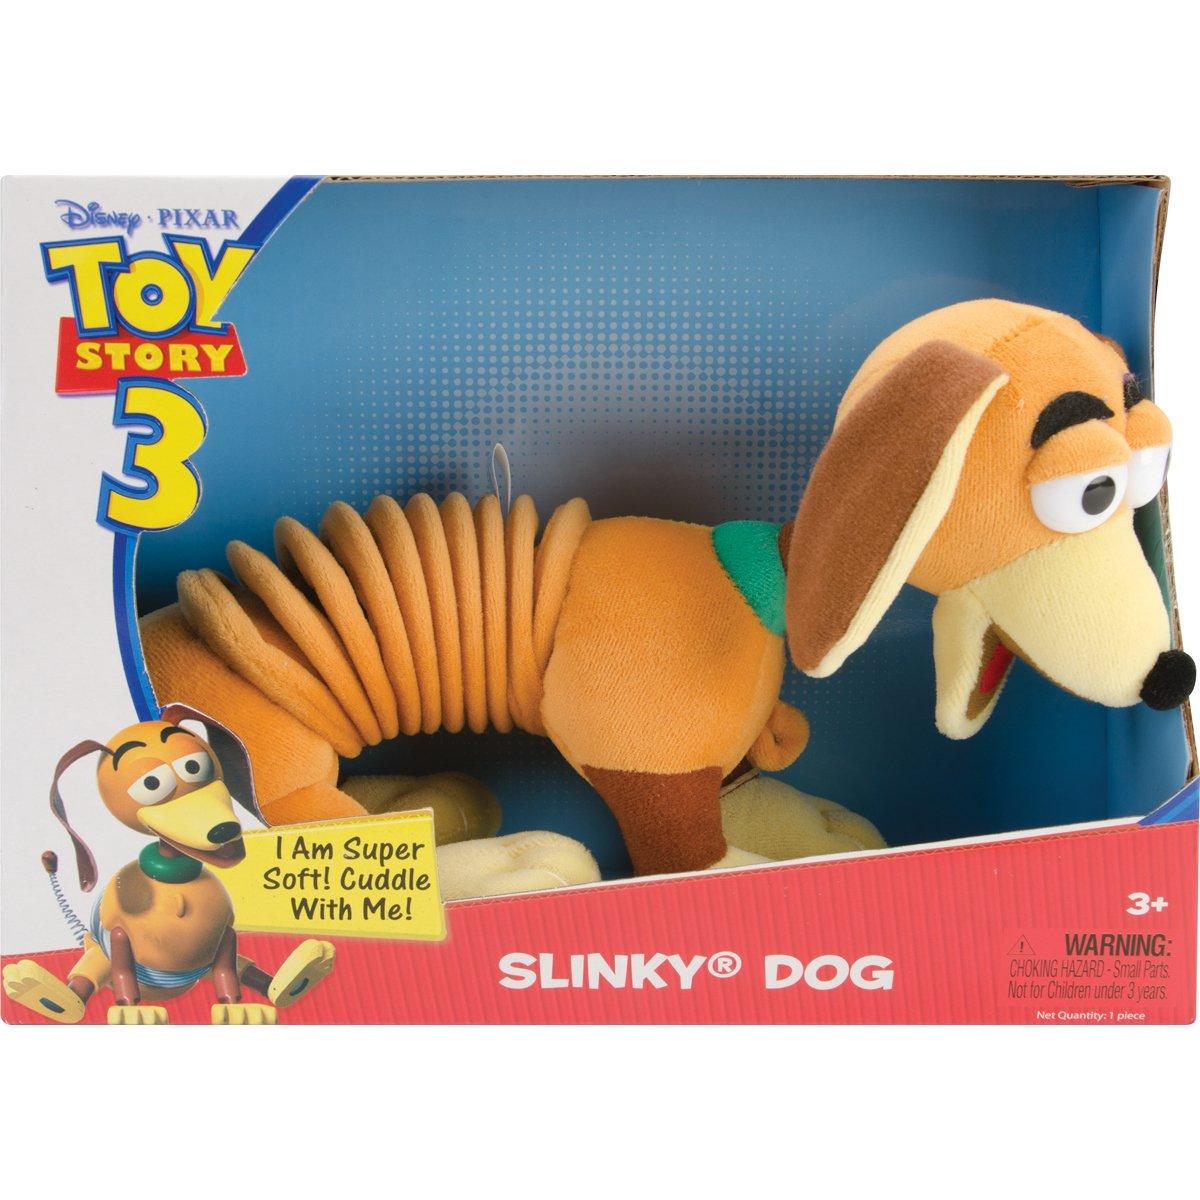 Soft Stuffed Animal Slinky Dog from Pixar's Toy Story